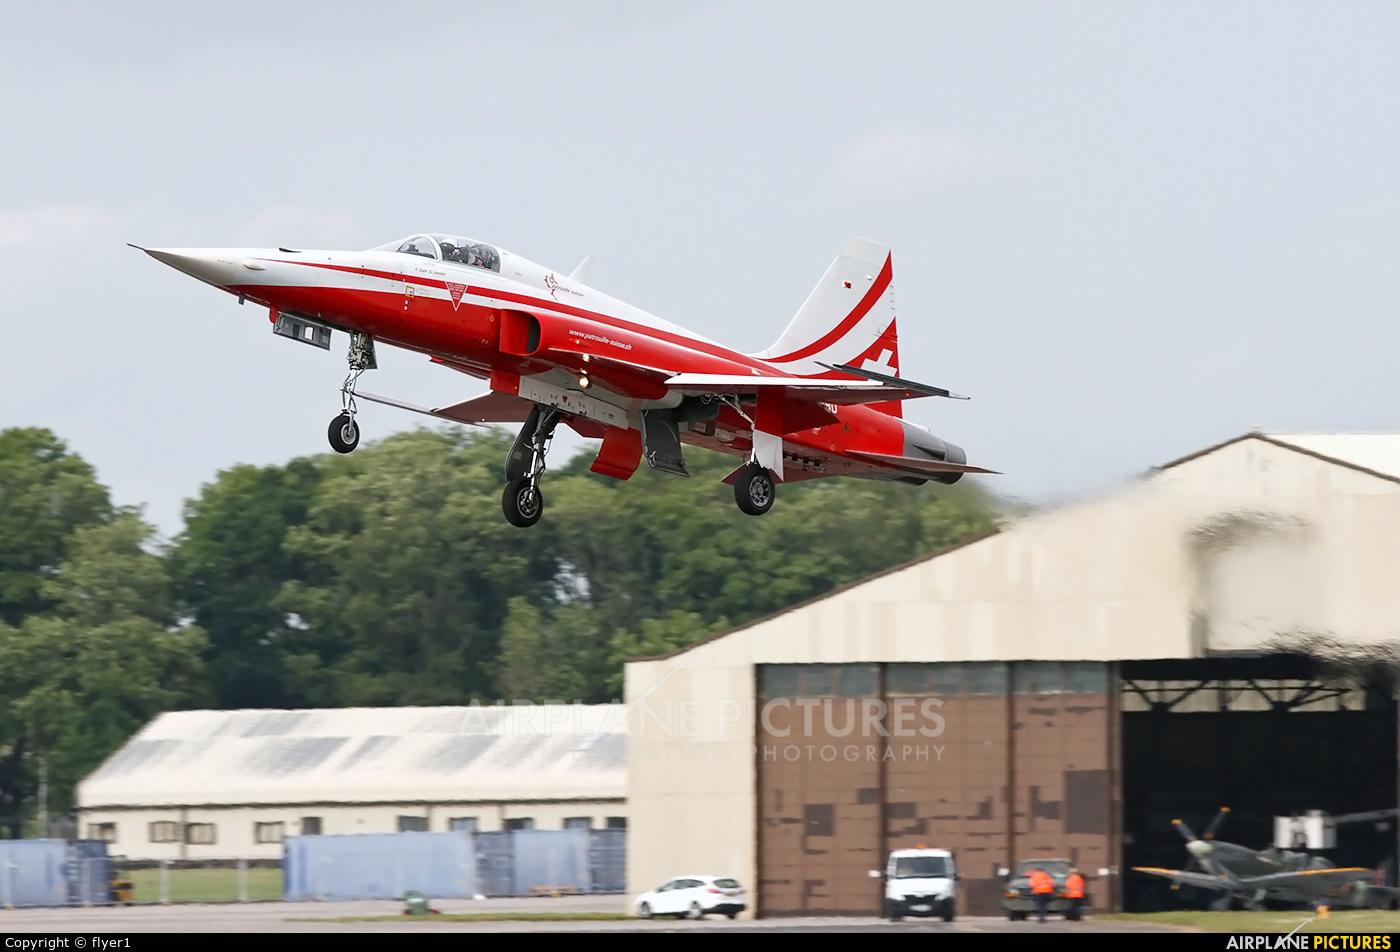 Switzerland - Air Force:  Patrouille de Suisse J-3090 aircraft at Fairford